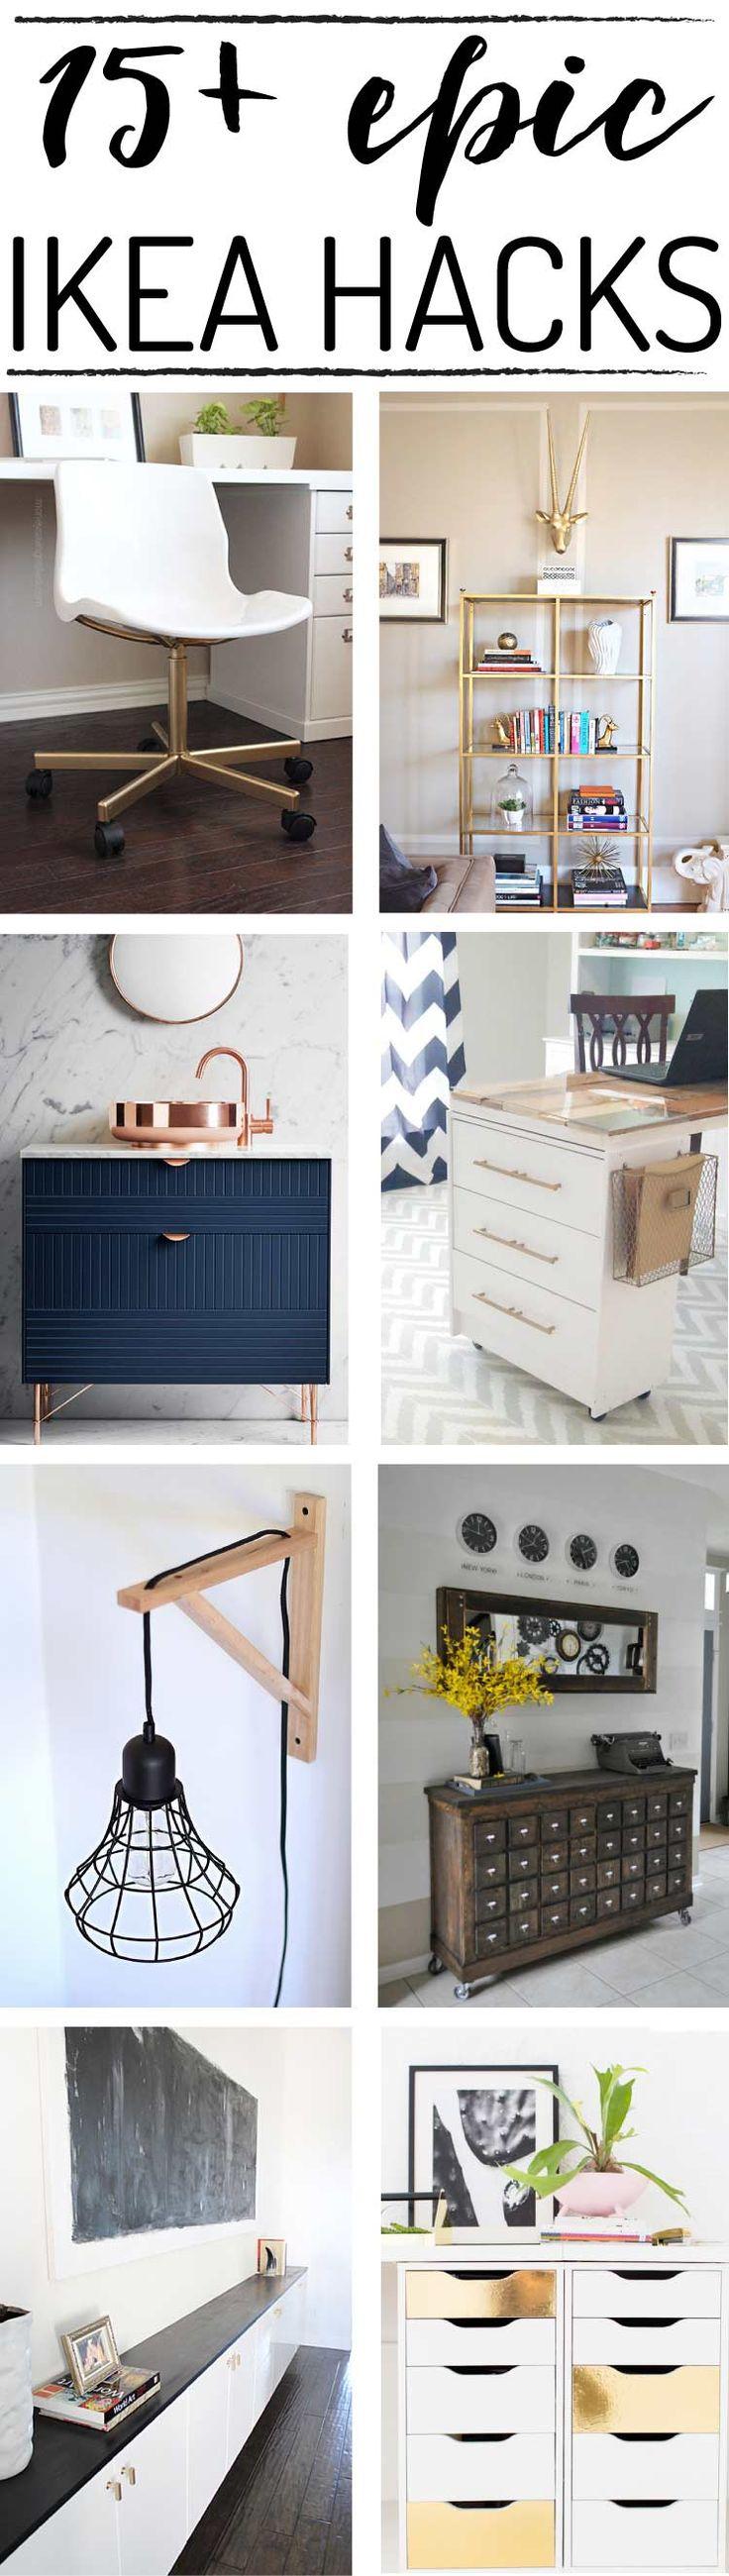 4952 best DIY images on Pinterest